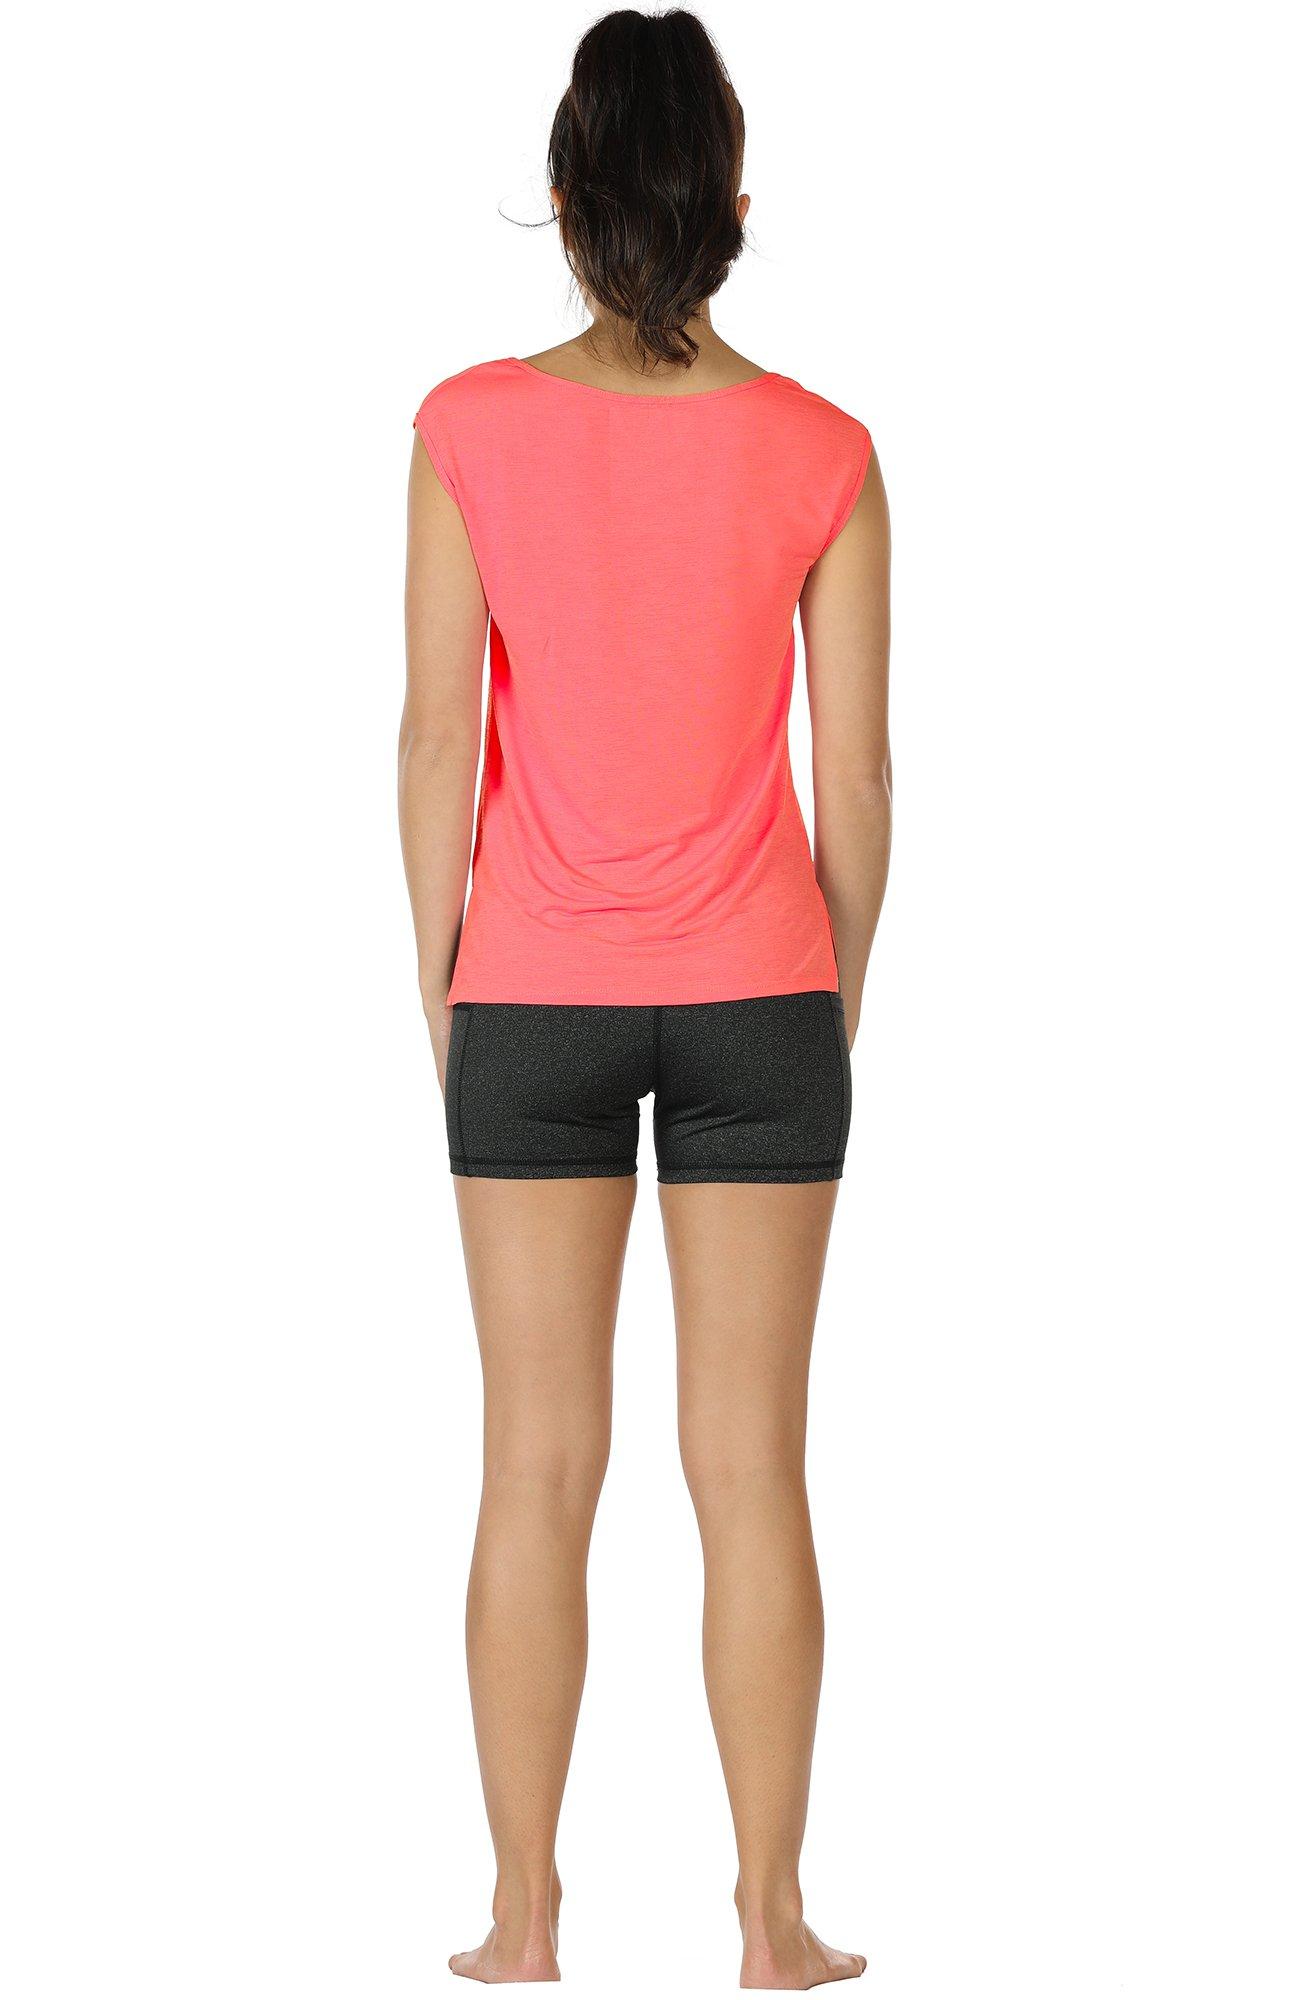 icyzone Yoga Tops Activewear Sleeveless Workout Running Shirts Flowy Tank Tops for Women (M, Black&Mandarin Red)